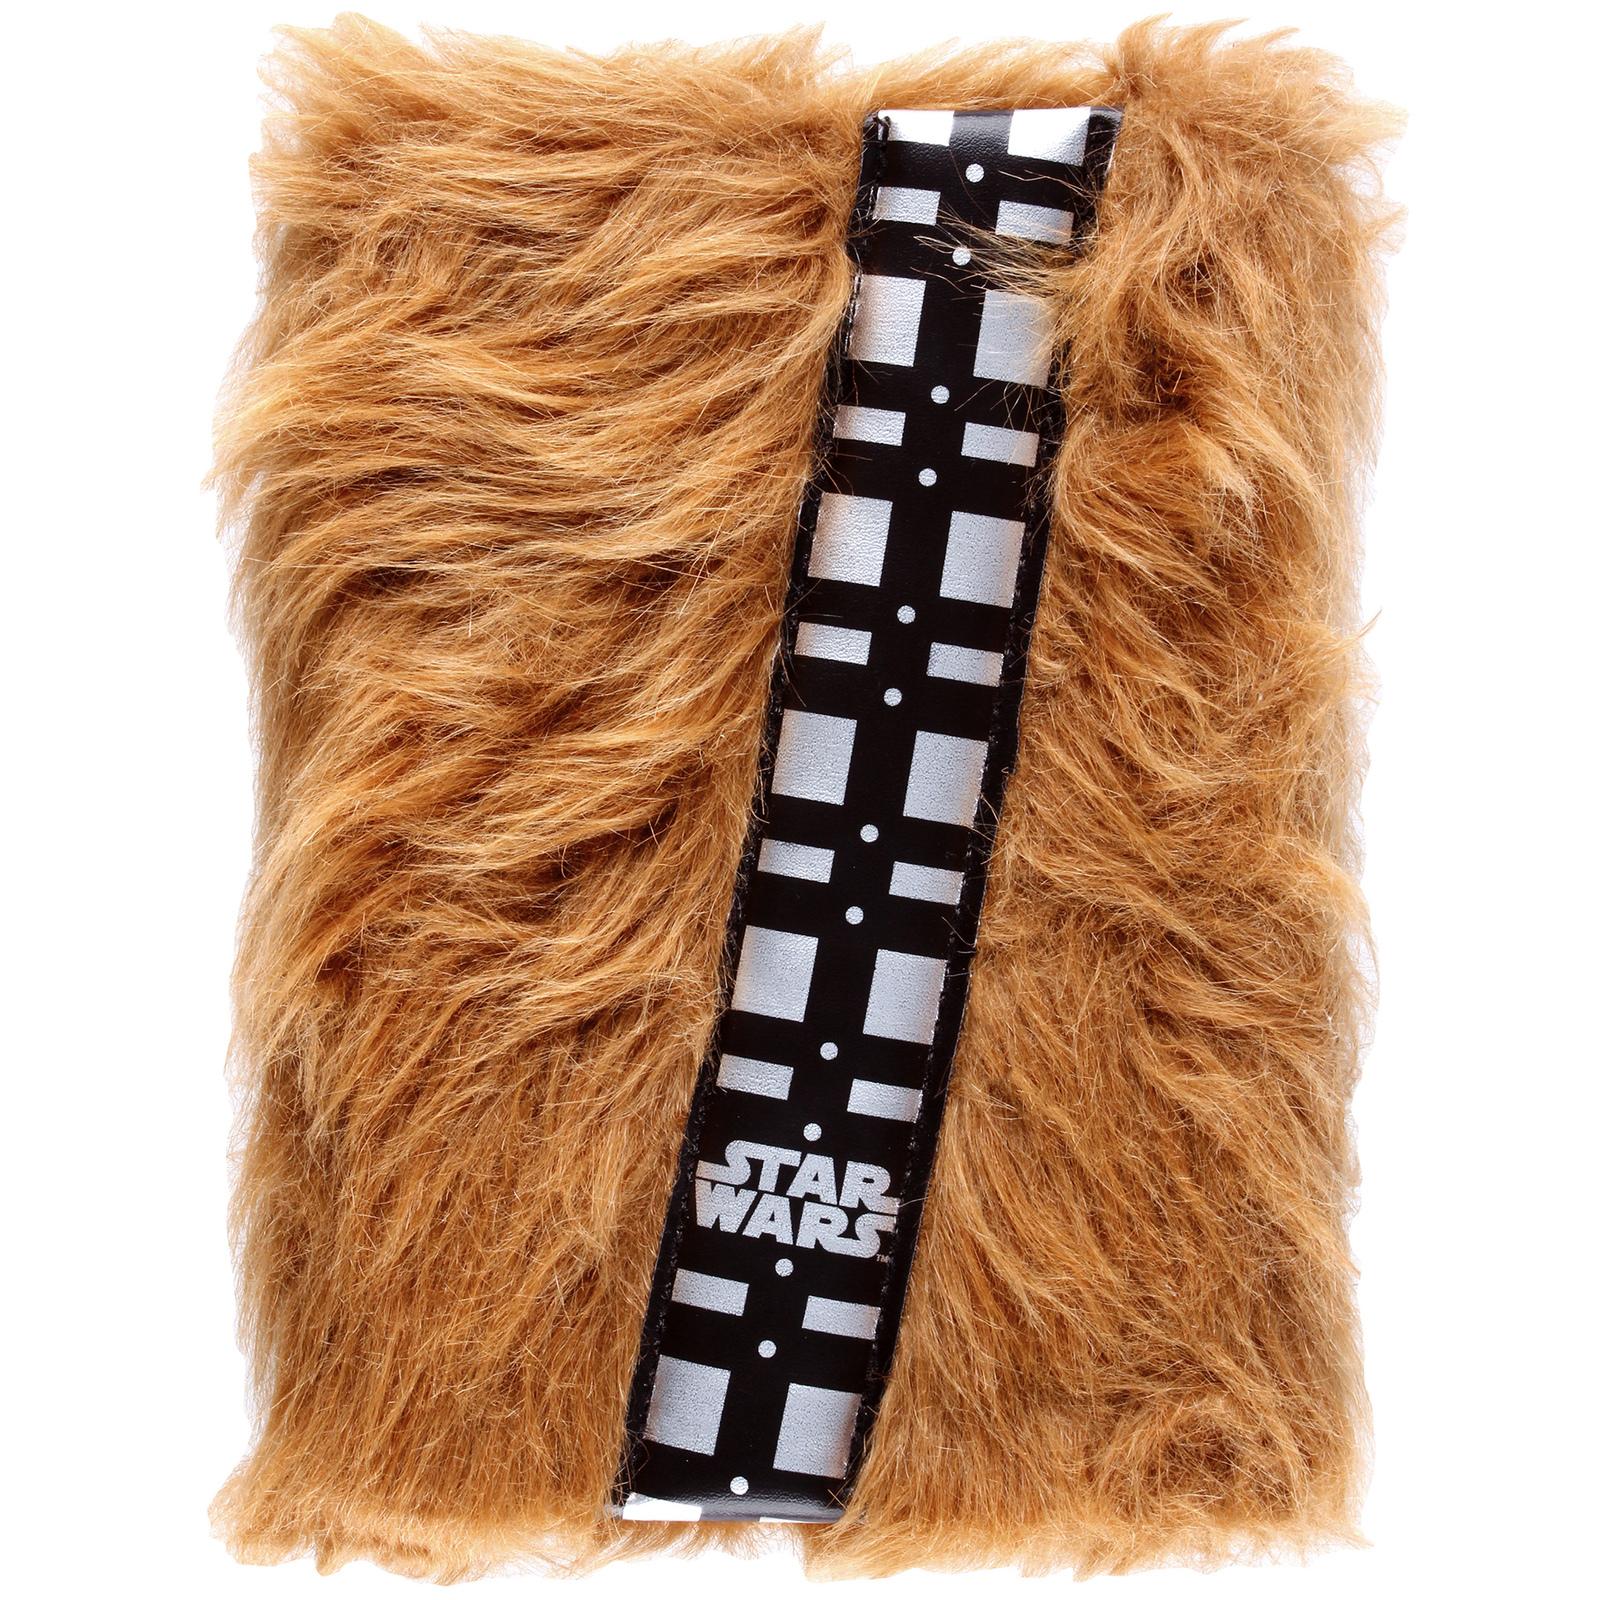 Star Wars Episode VII Premium A5 Notebook - Chewbacca Fur image